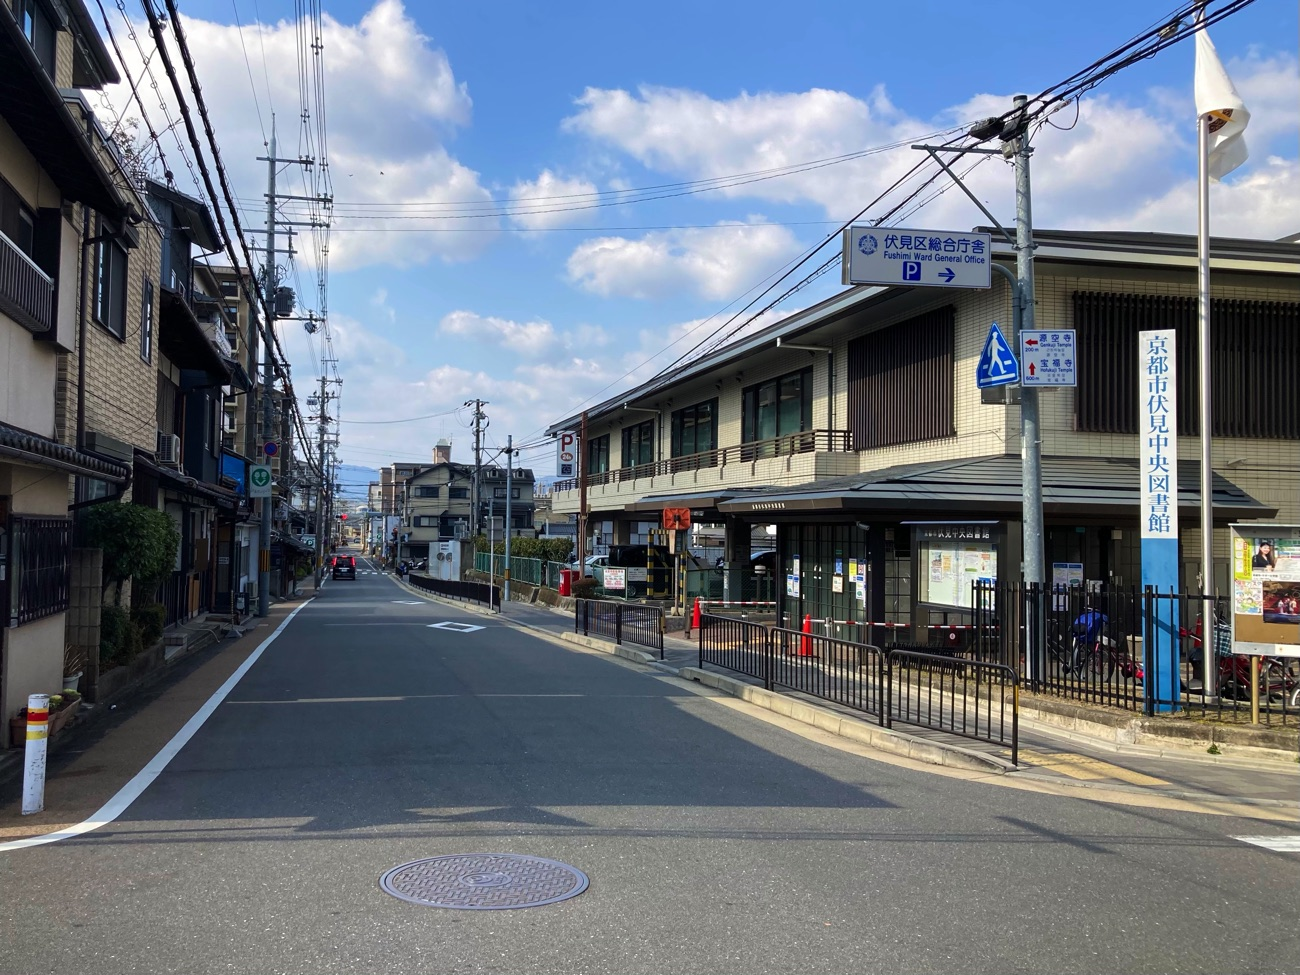 京都市伏見中央図書館の南側の道路